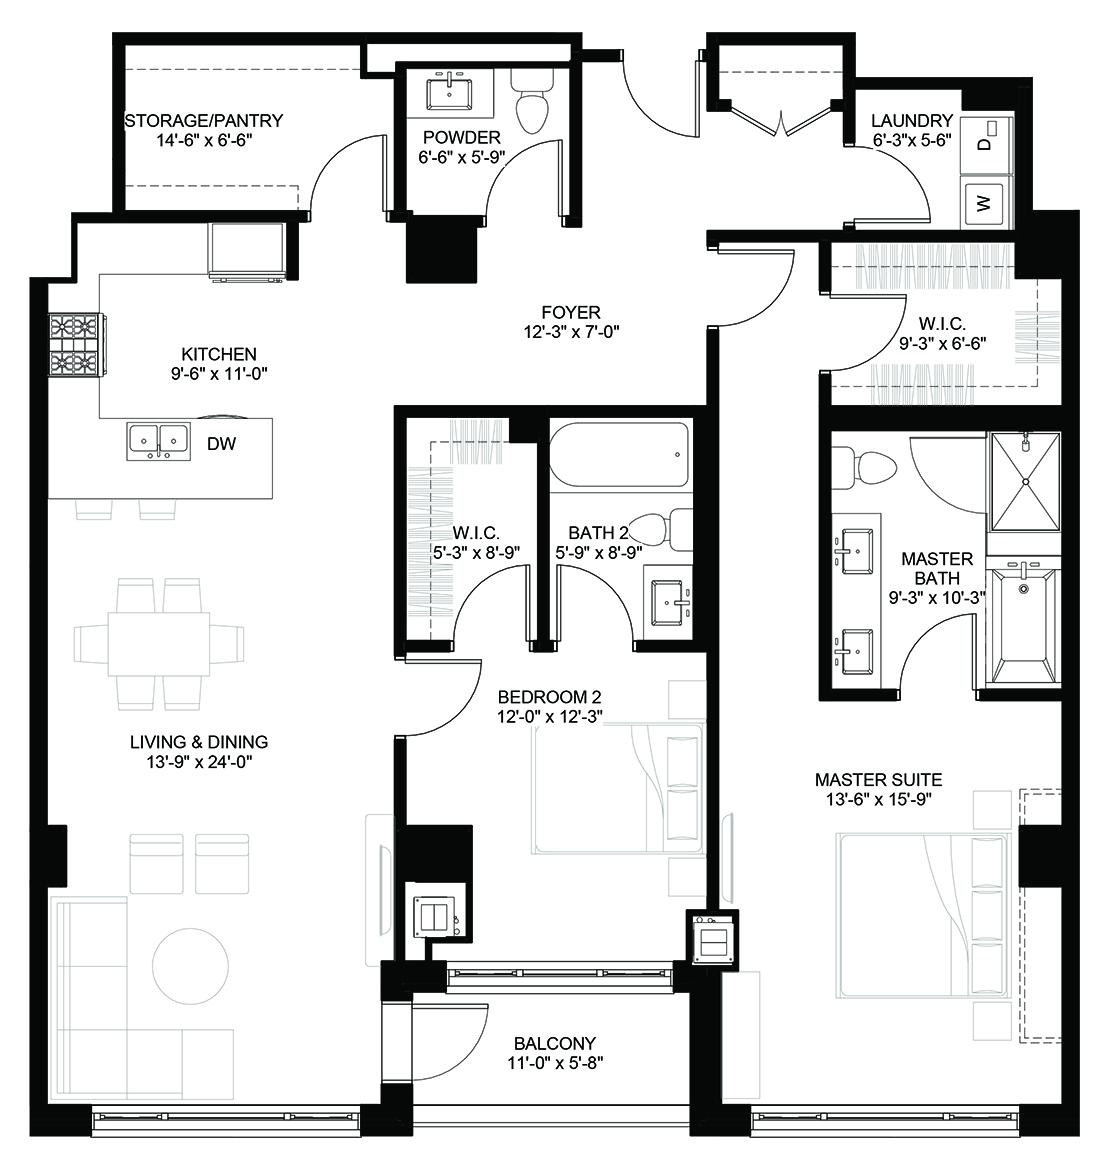 207_307_407_Floorplan.jpg